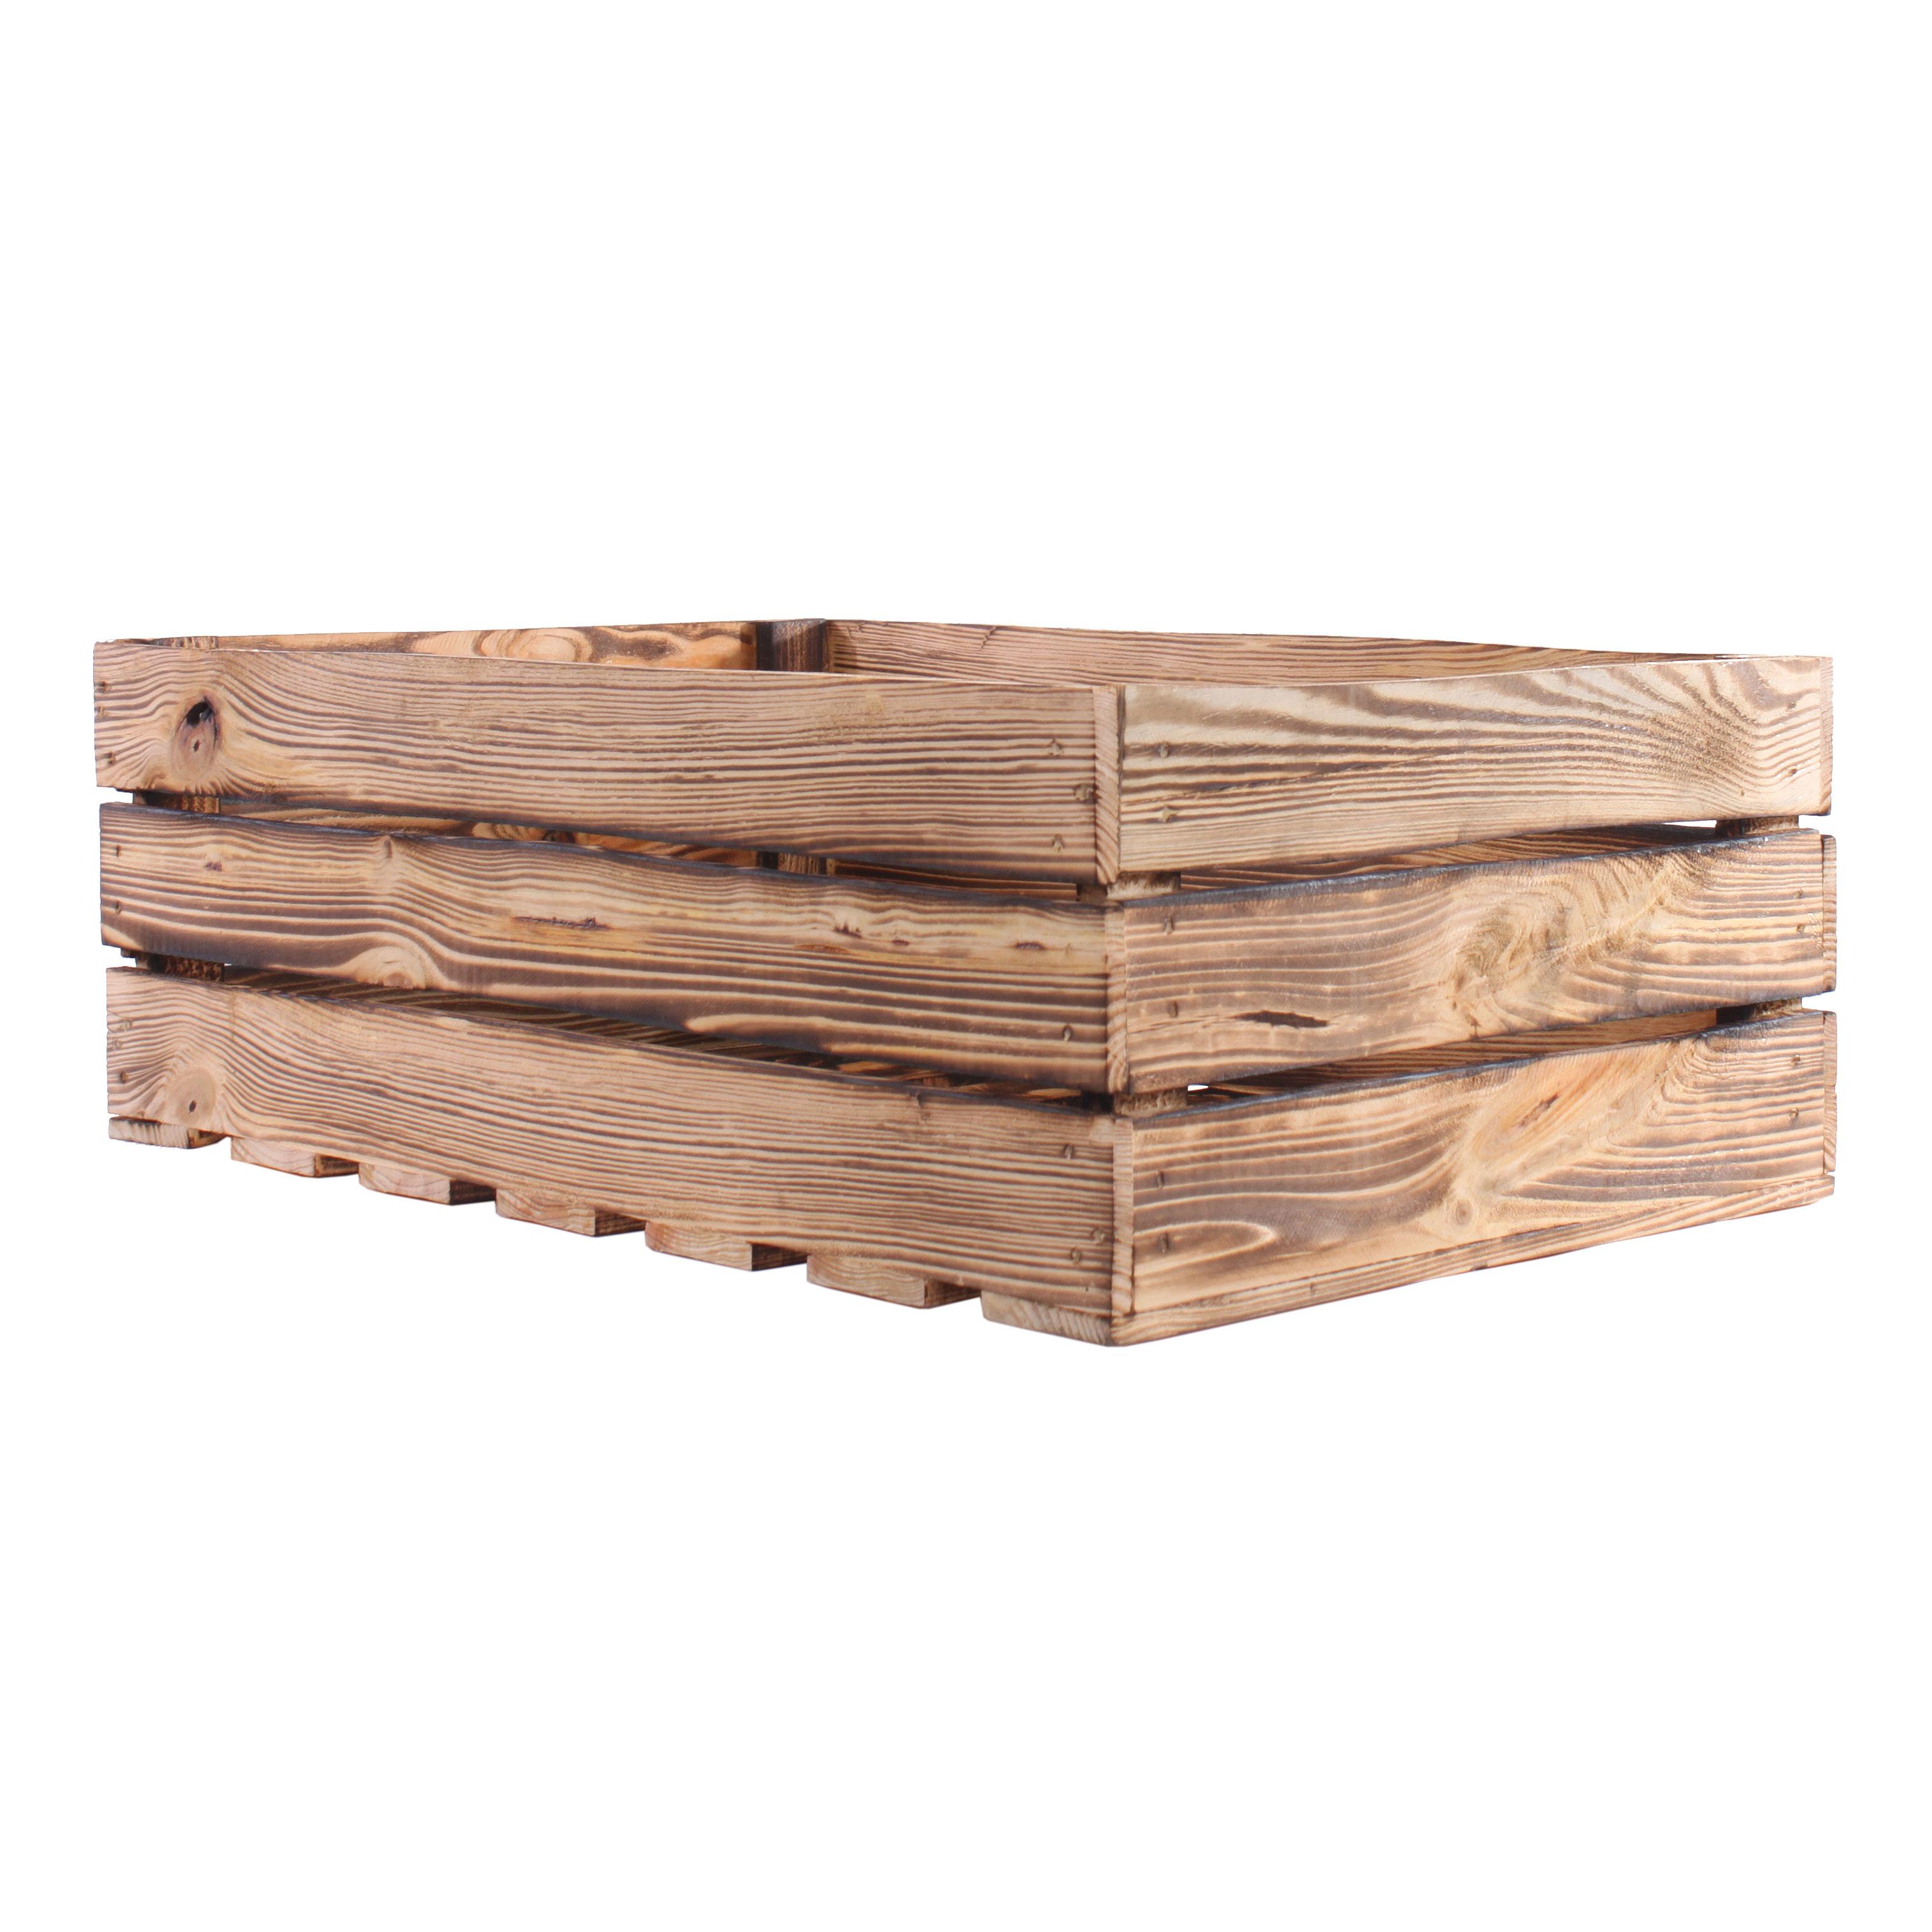 Deko Holzkiste geflammt 60x40x21cm Obstkiste Holzbox